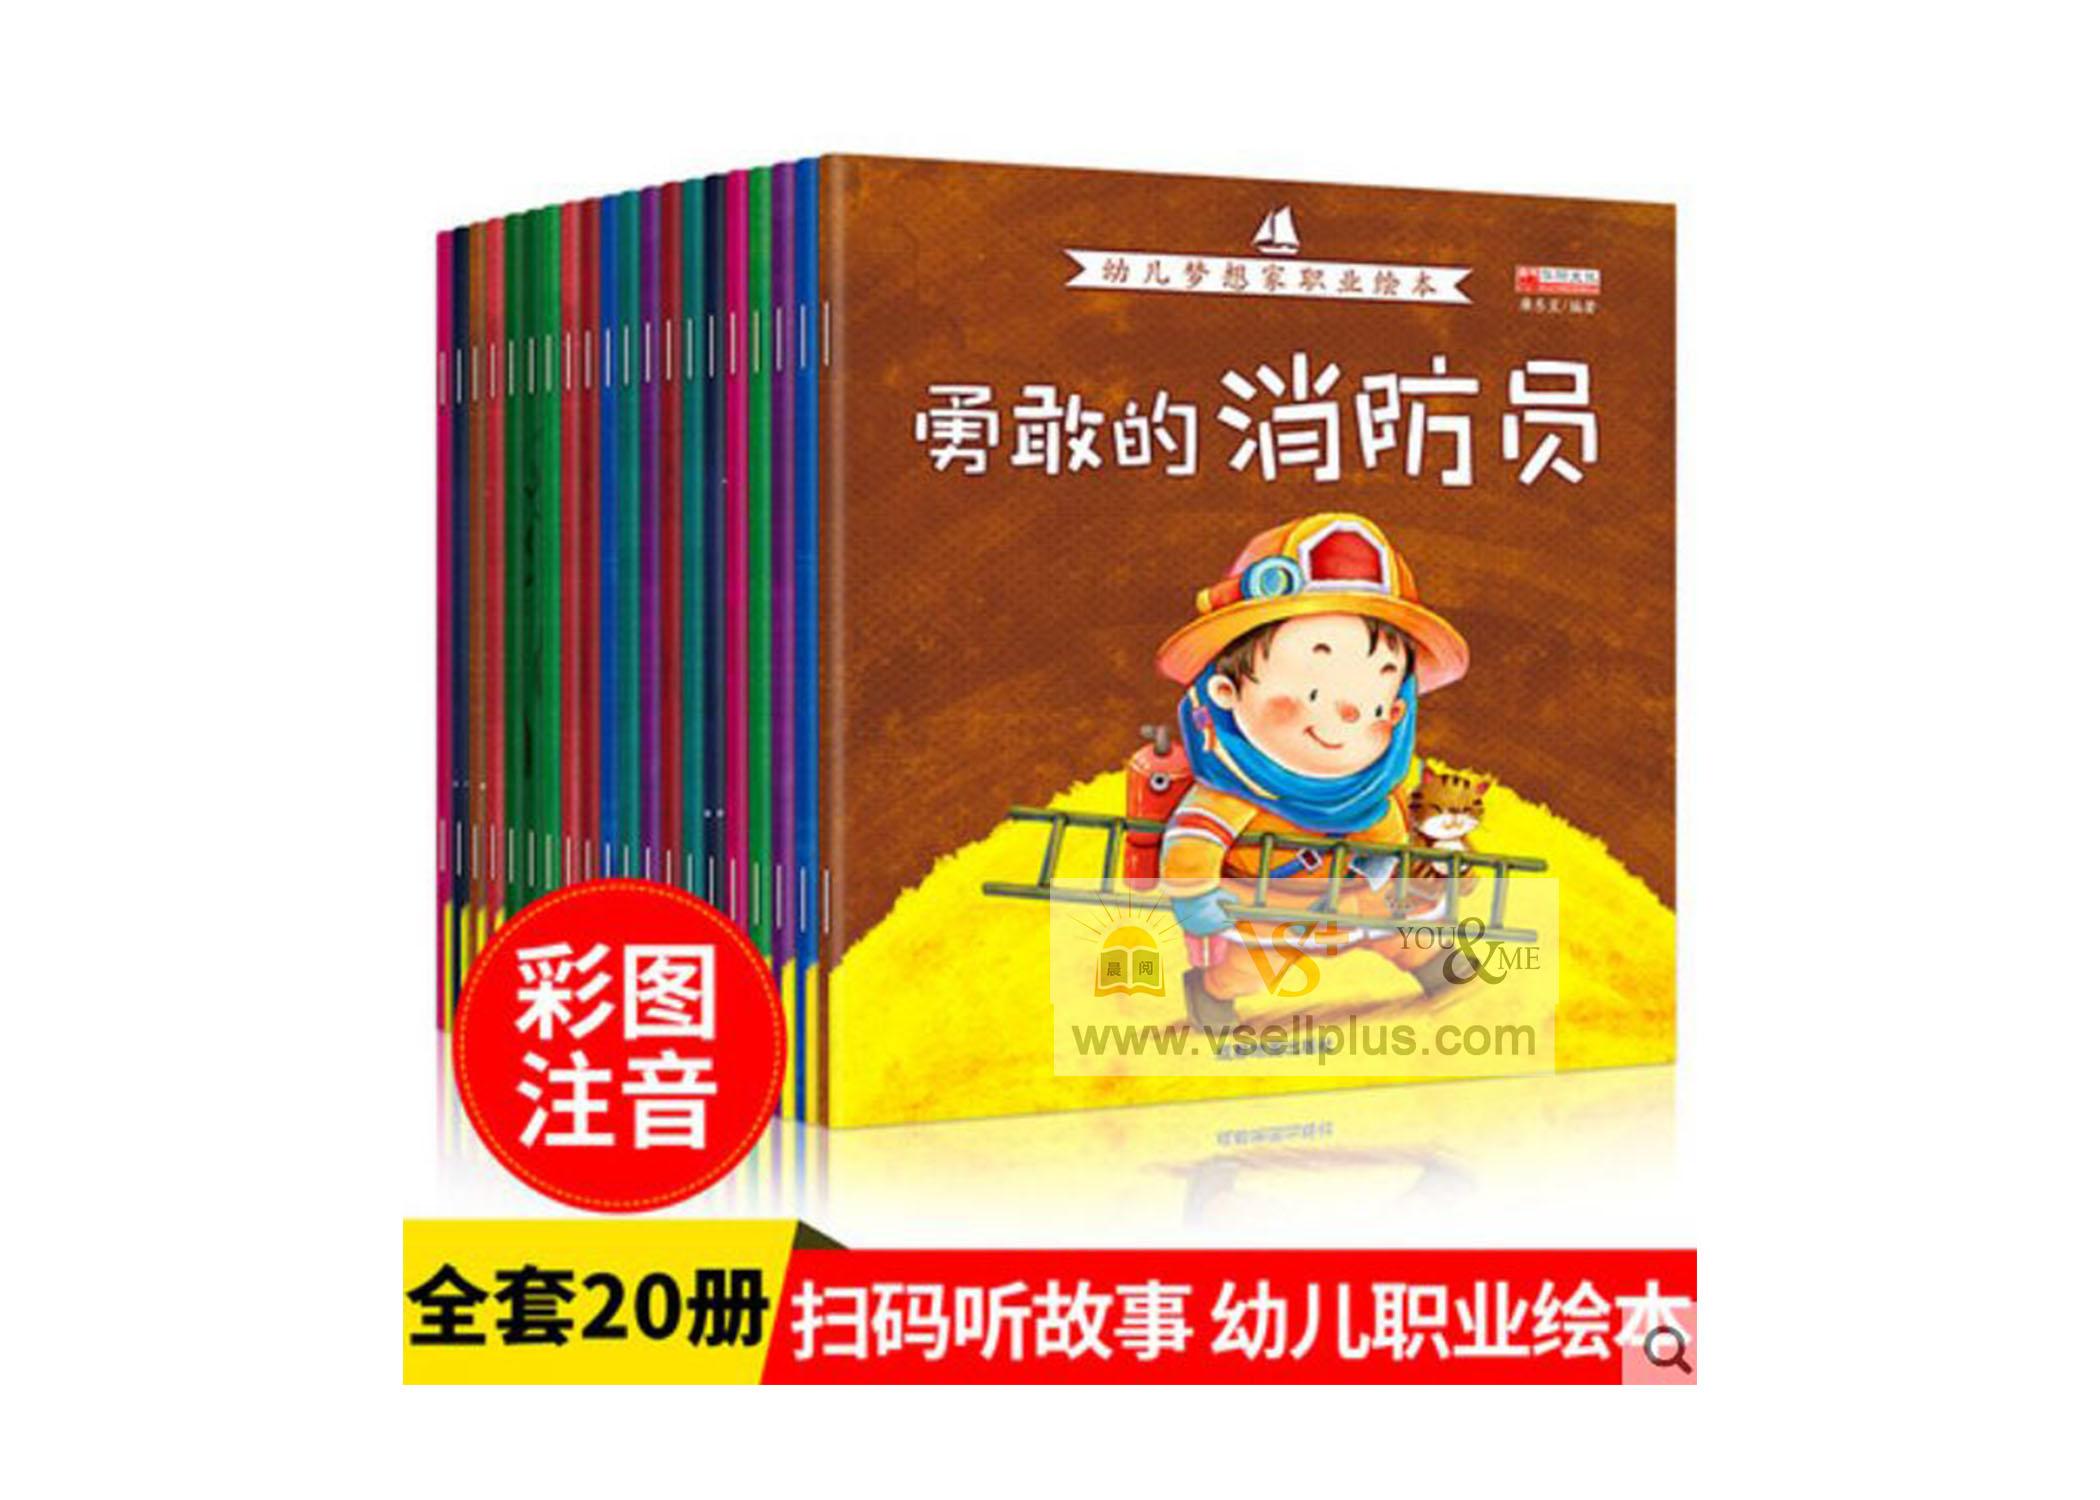 Ready Stock- Children Occupation books 全套20册幼儿梦想家职业绘本注音版有声伴读幼儿职业早教启蒙认知书